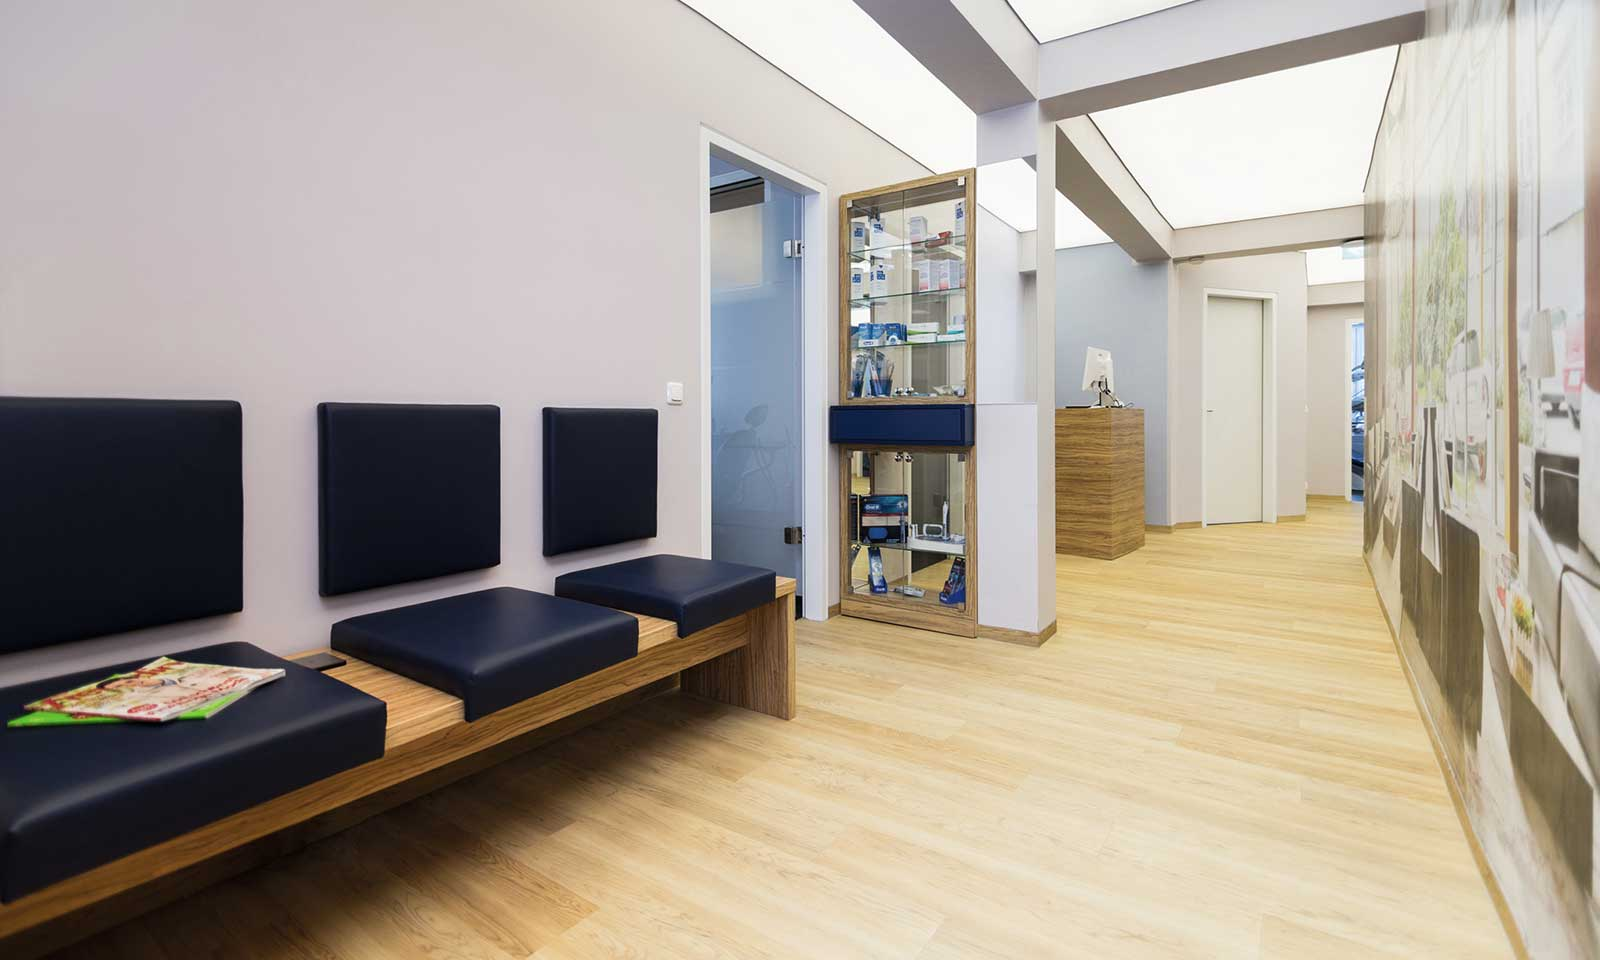 04-kreienbaum-tischlerei-praxen-krankenhaus